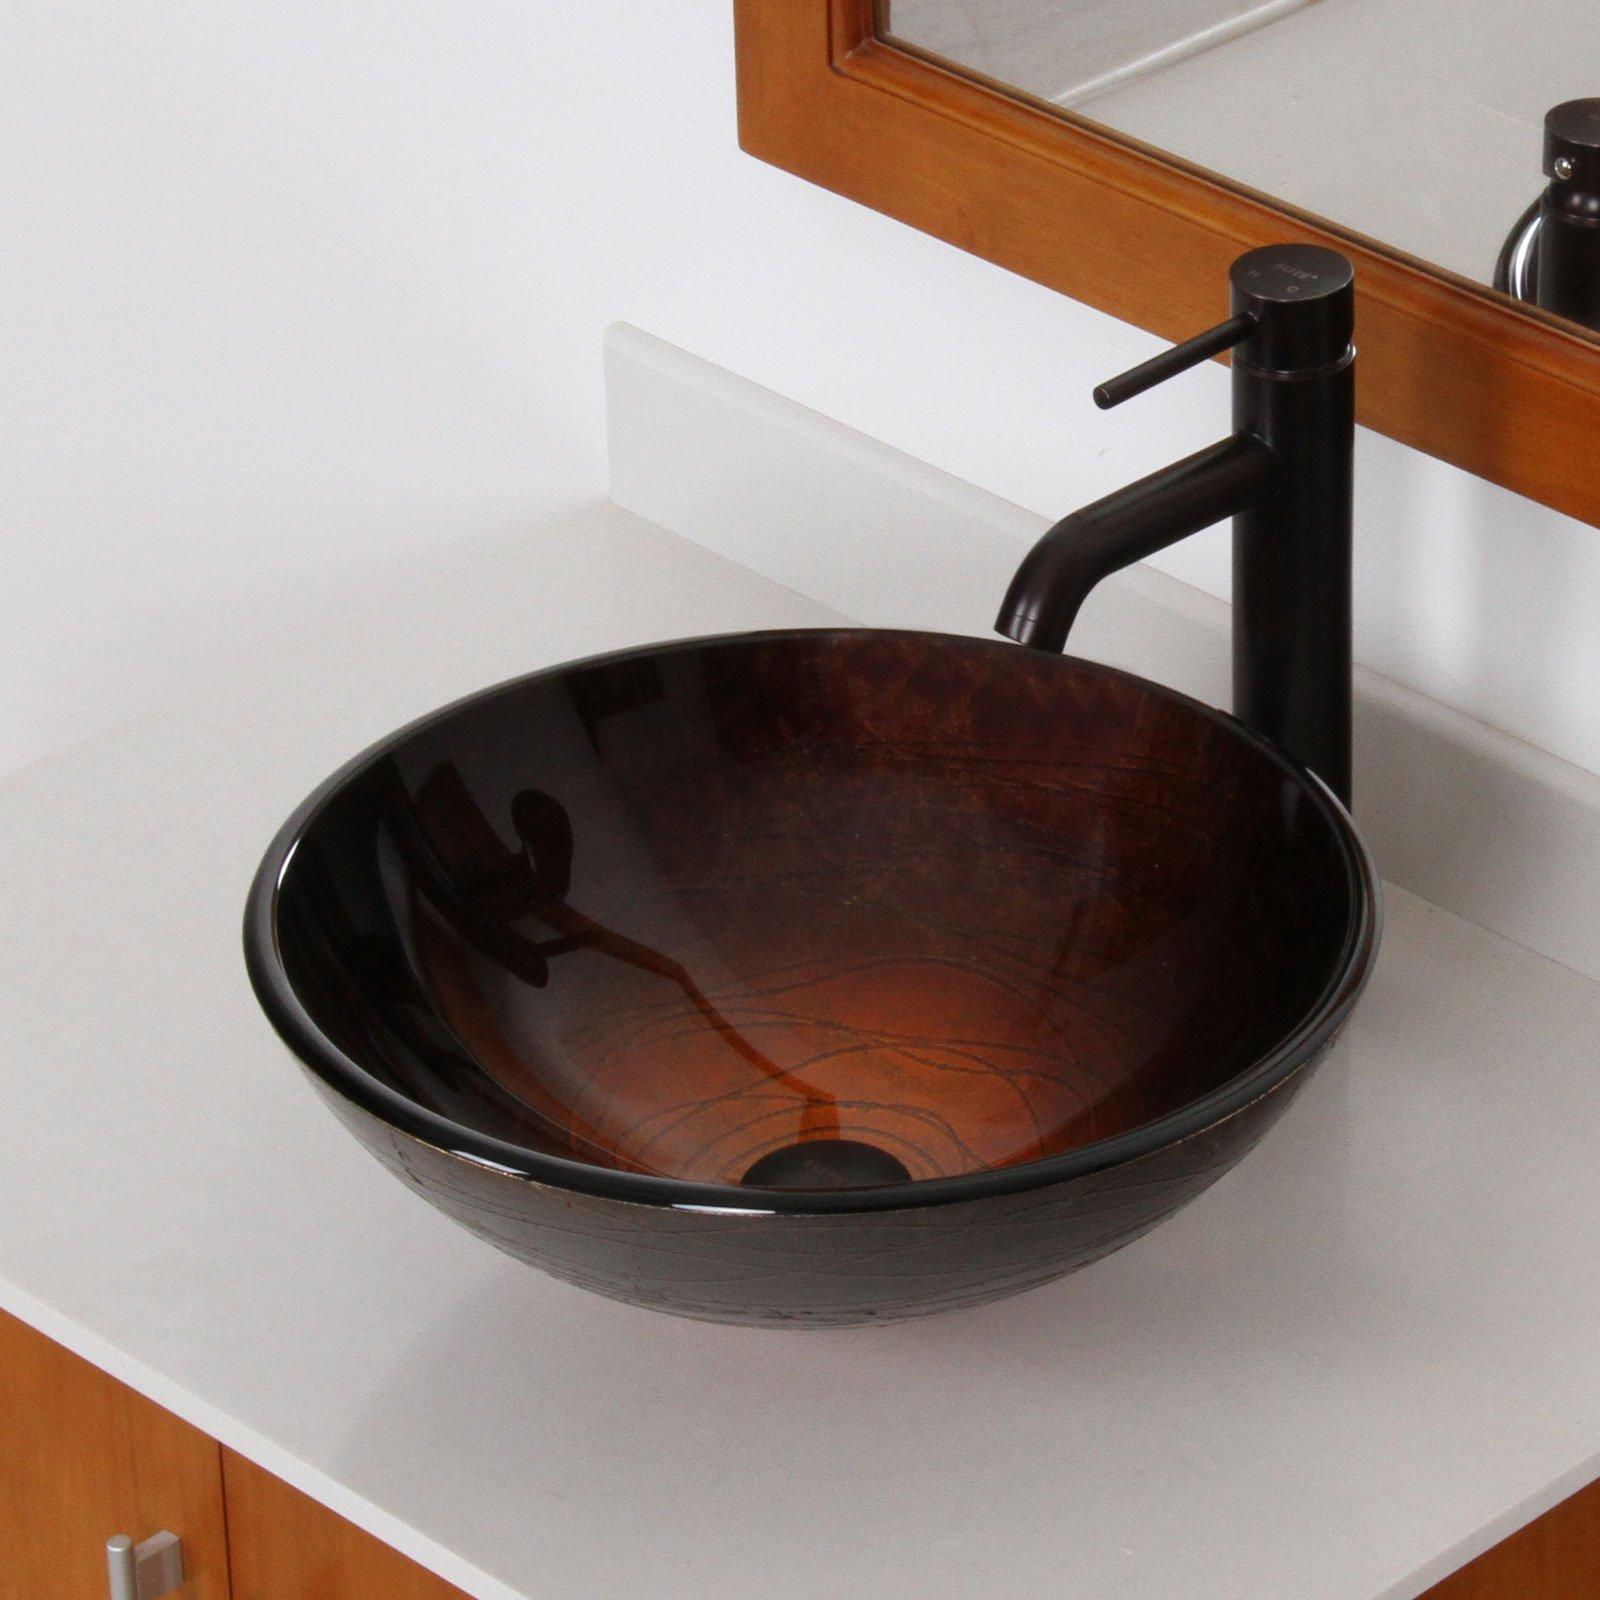 ELITE Tempered Bathroom Dark Style Glass Vessel Sink & Oil Rubbed Bronze Single Lever Faucet Combo